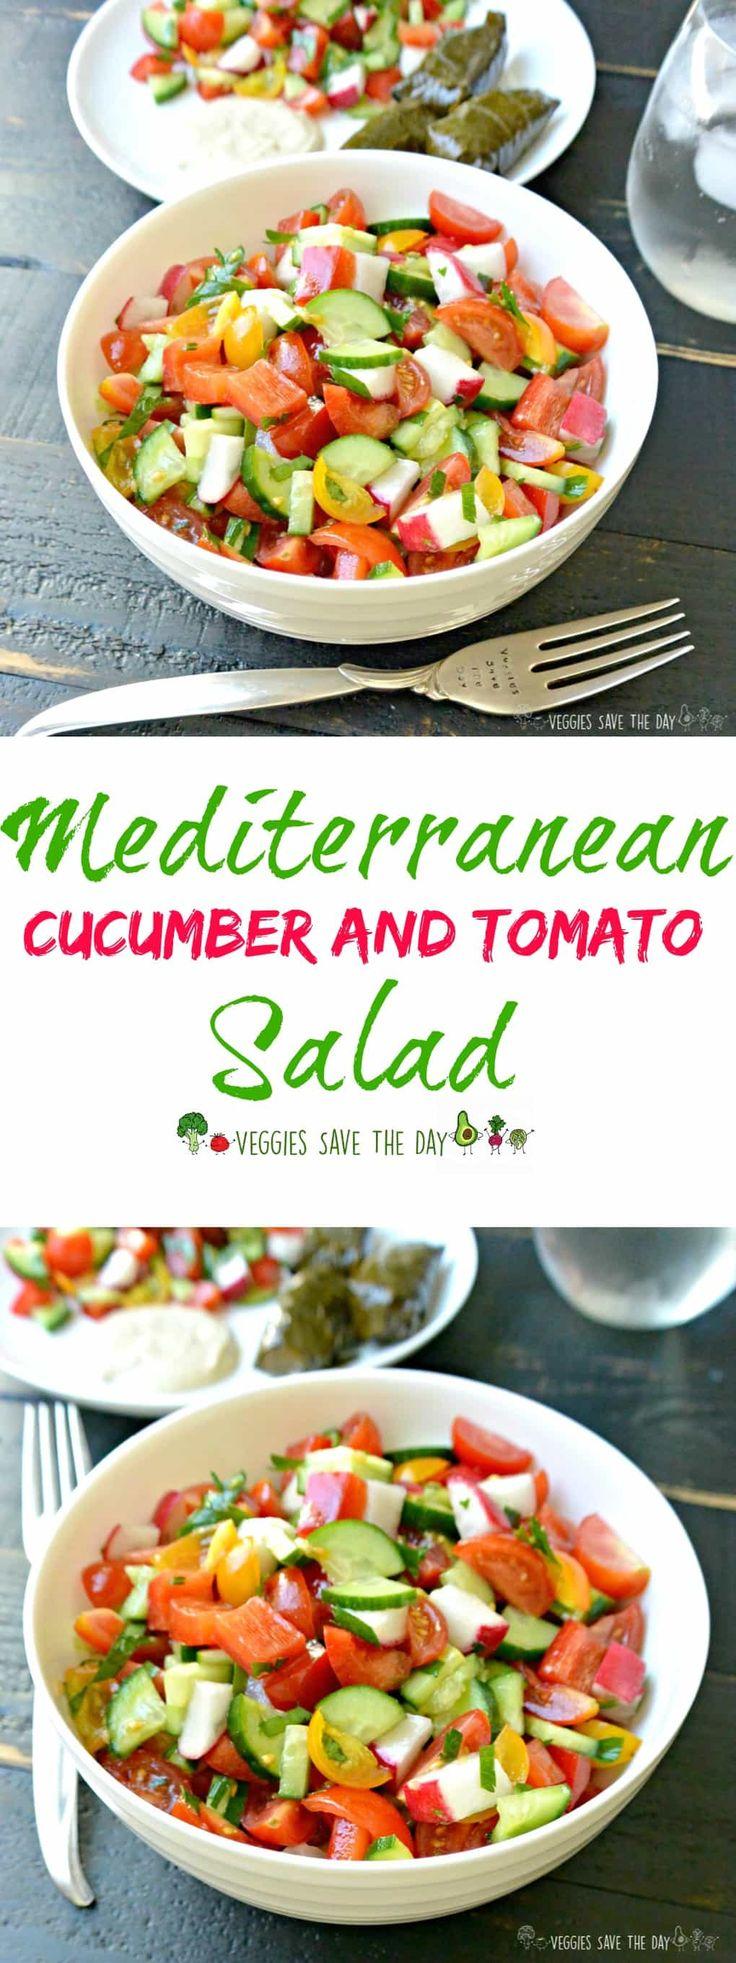 Herbal hibiscus tea 55g dr bean australia - Mediterranean Cucumber And Tomato Salad